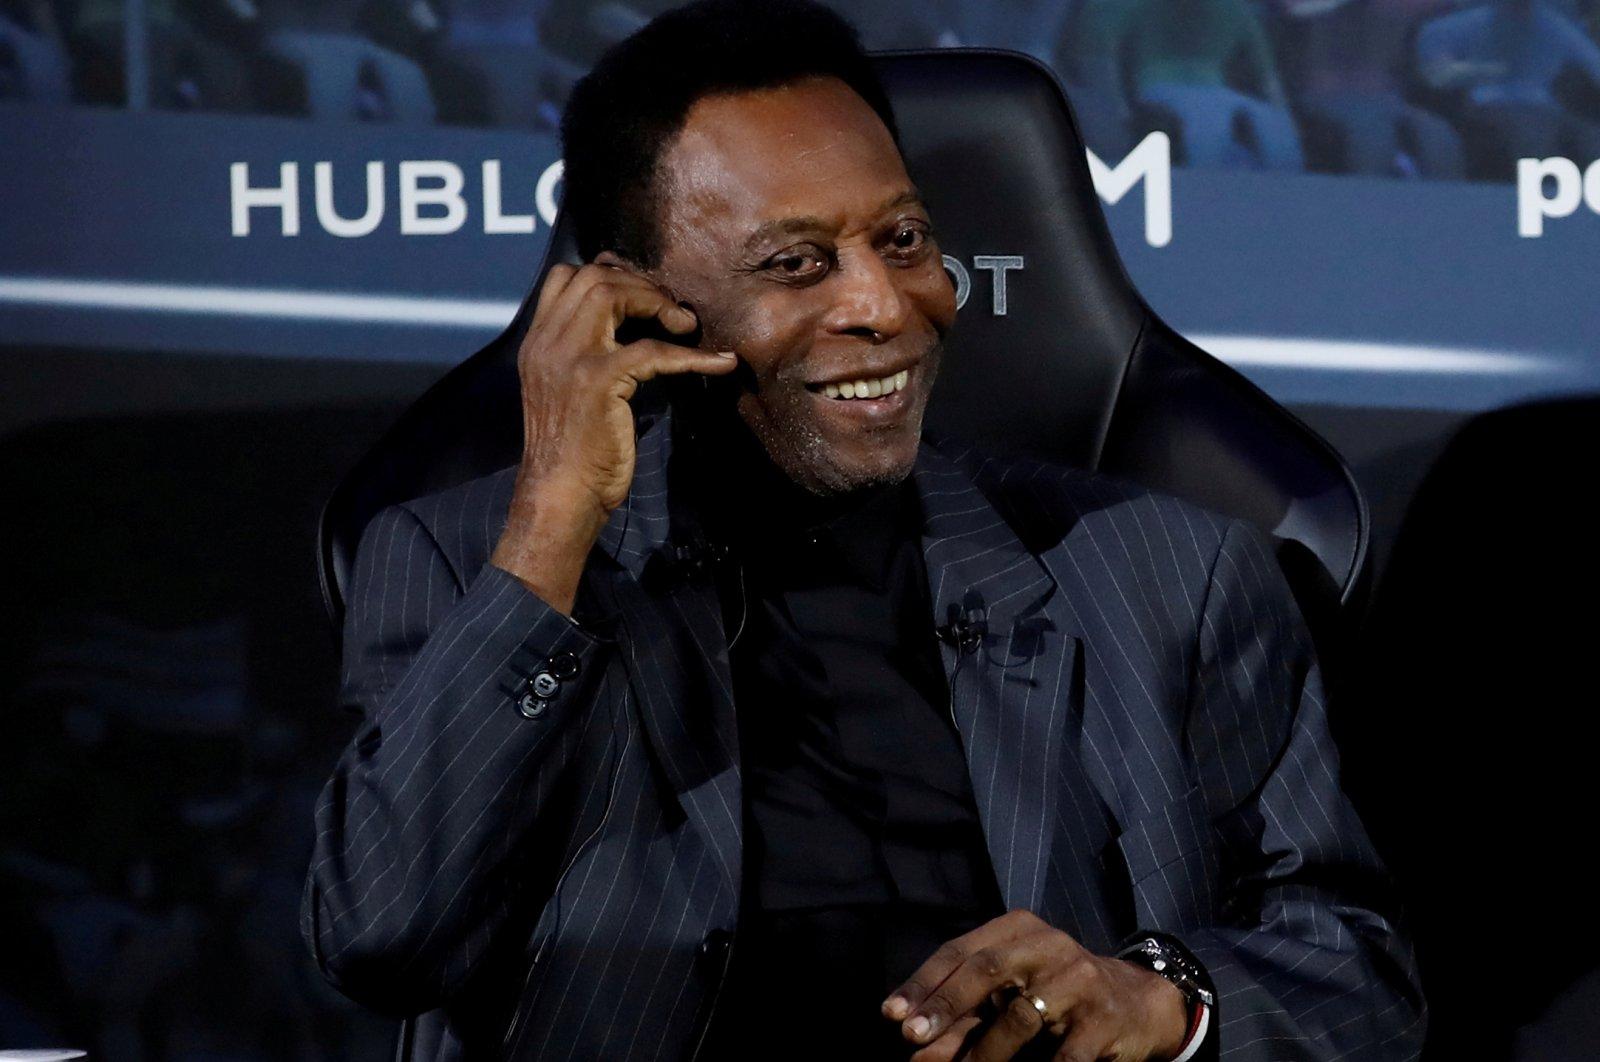 Brazilian football legend Pele attends an event in Paris, France, April 2, 2019. (Reuters Photo)